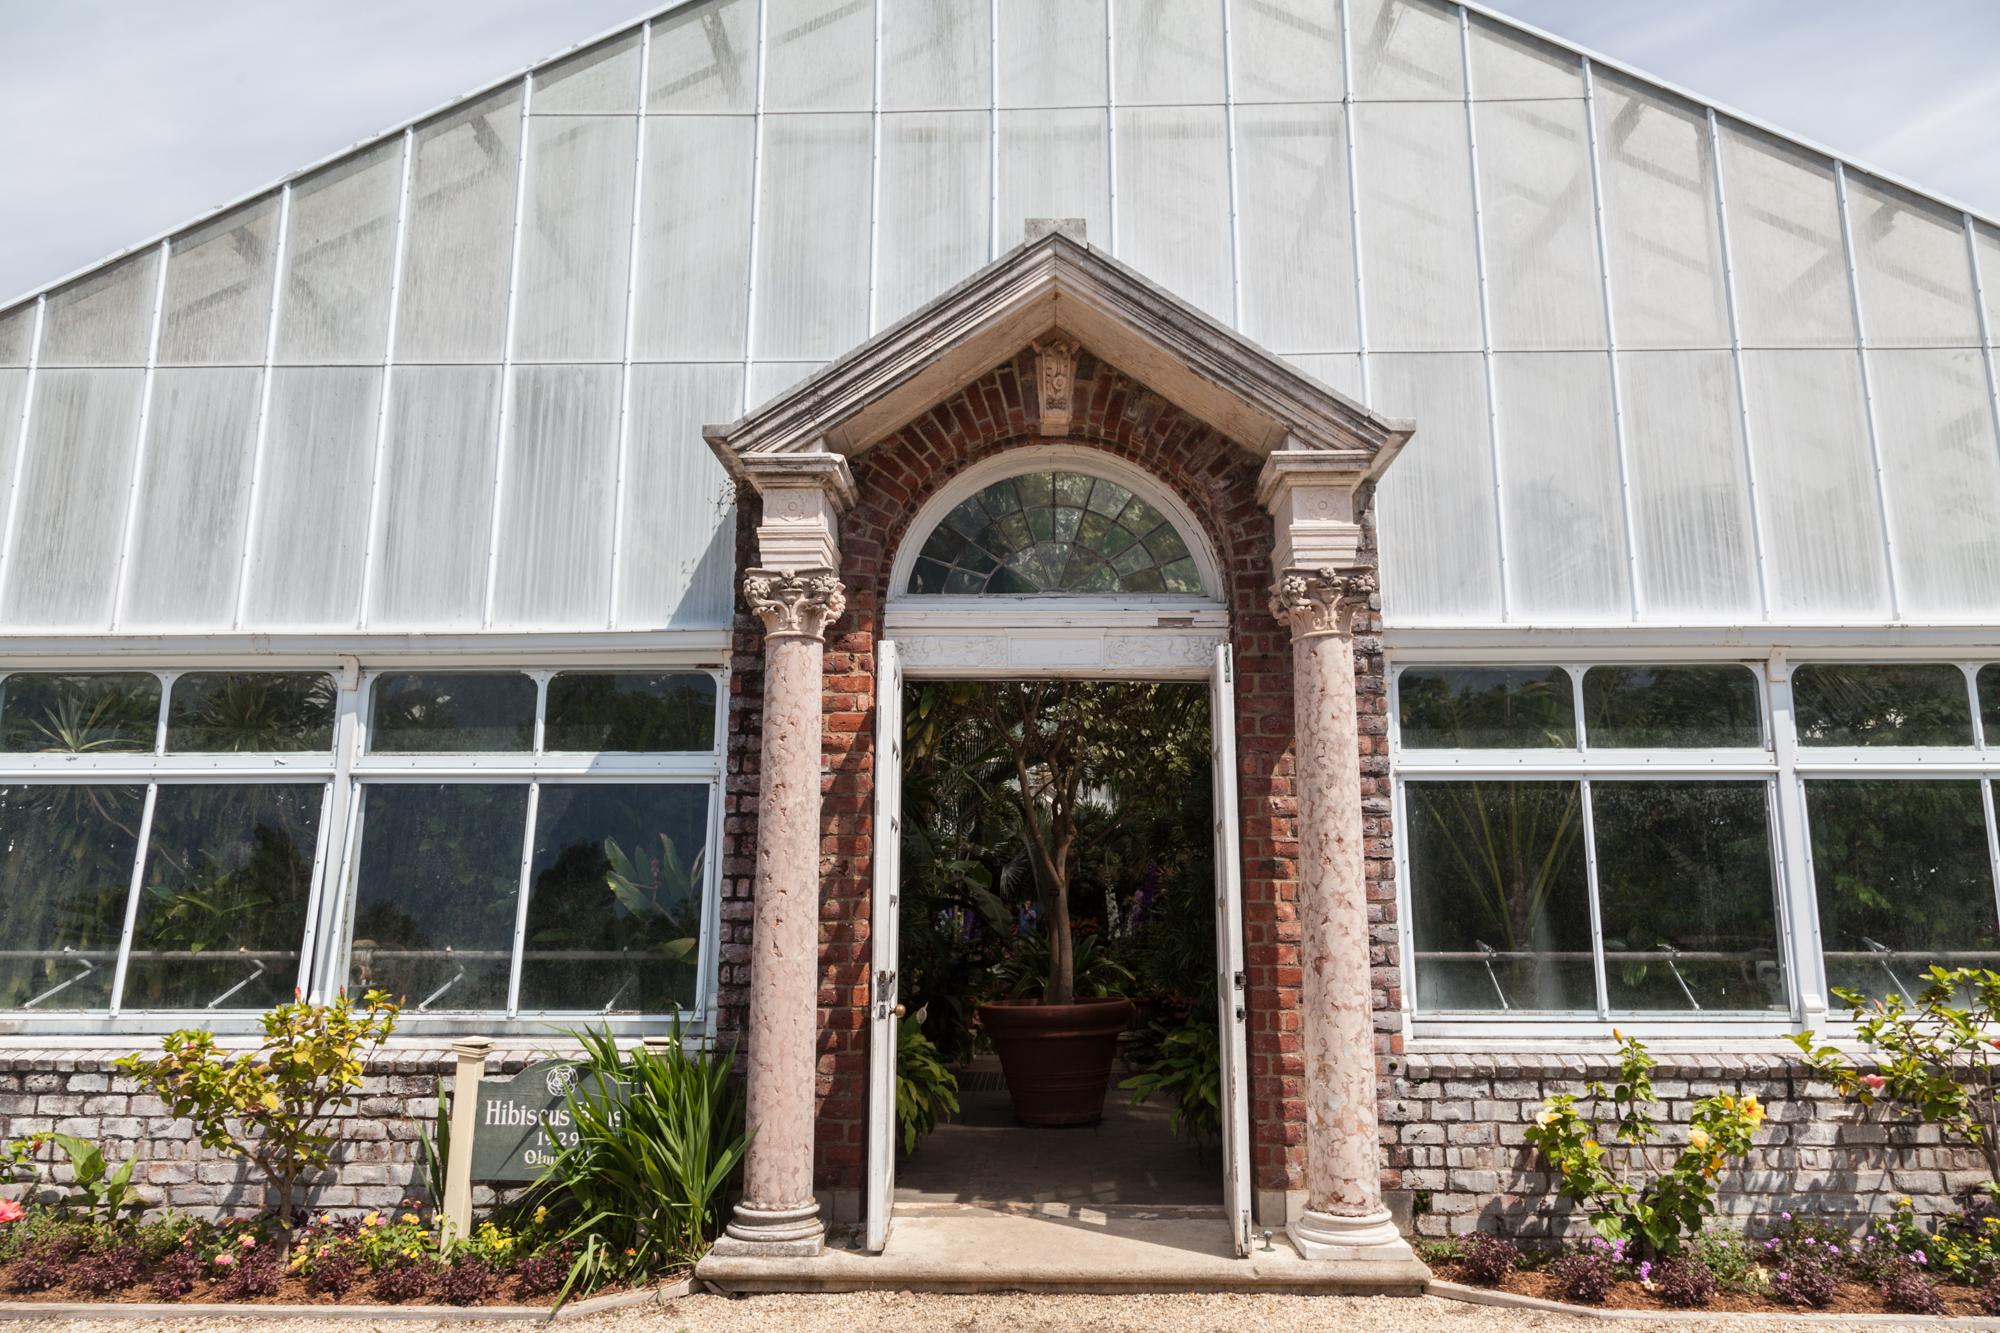 Planting-Fields-Greenhouse-Summer-Rayne-Oakes-Homestead-Brooklyn.jpg